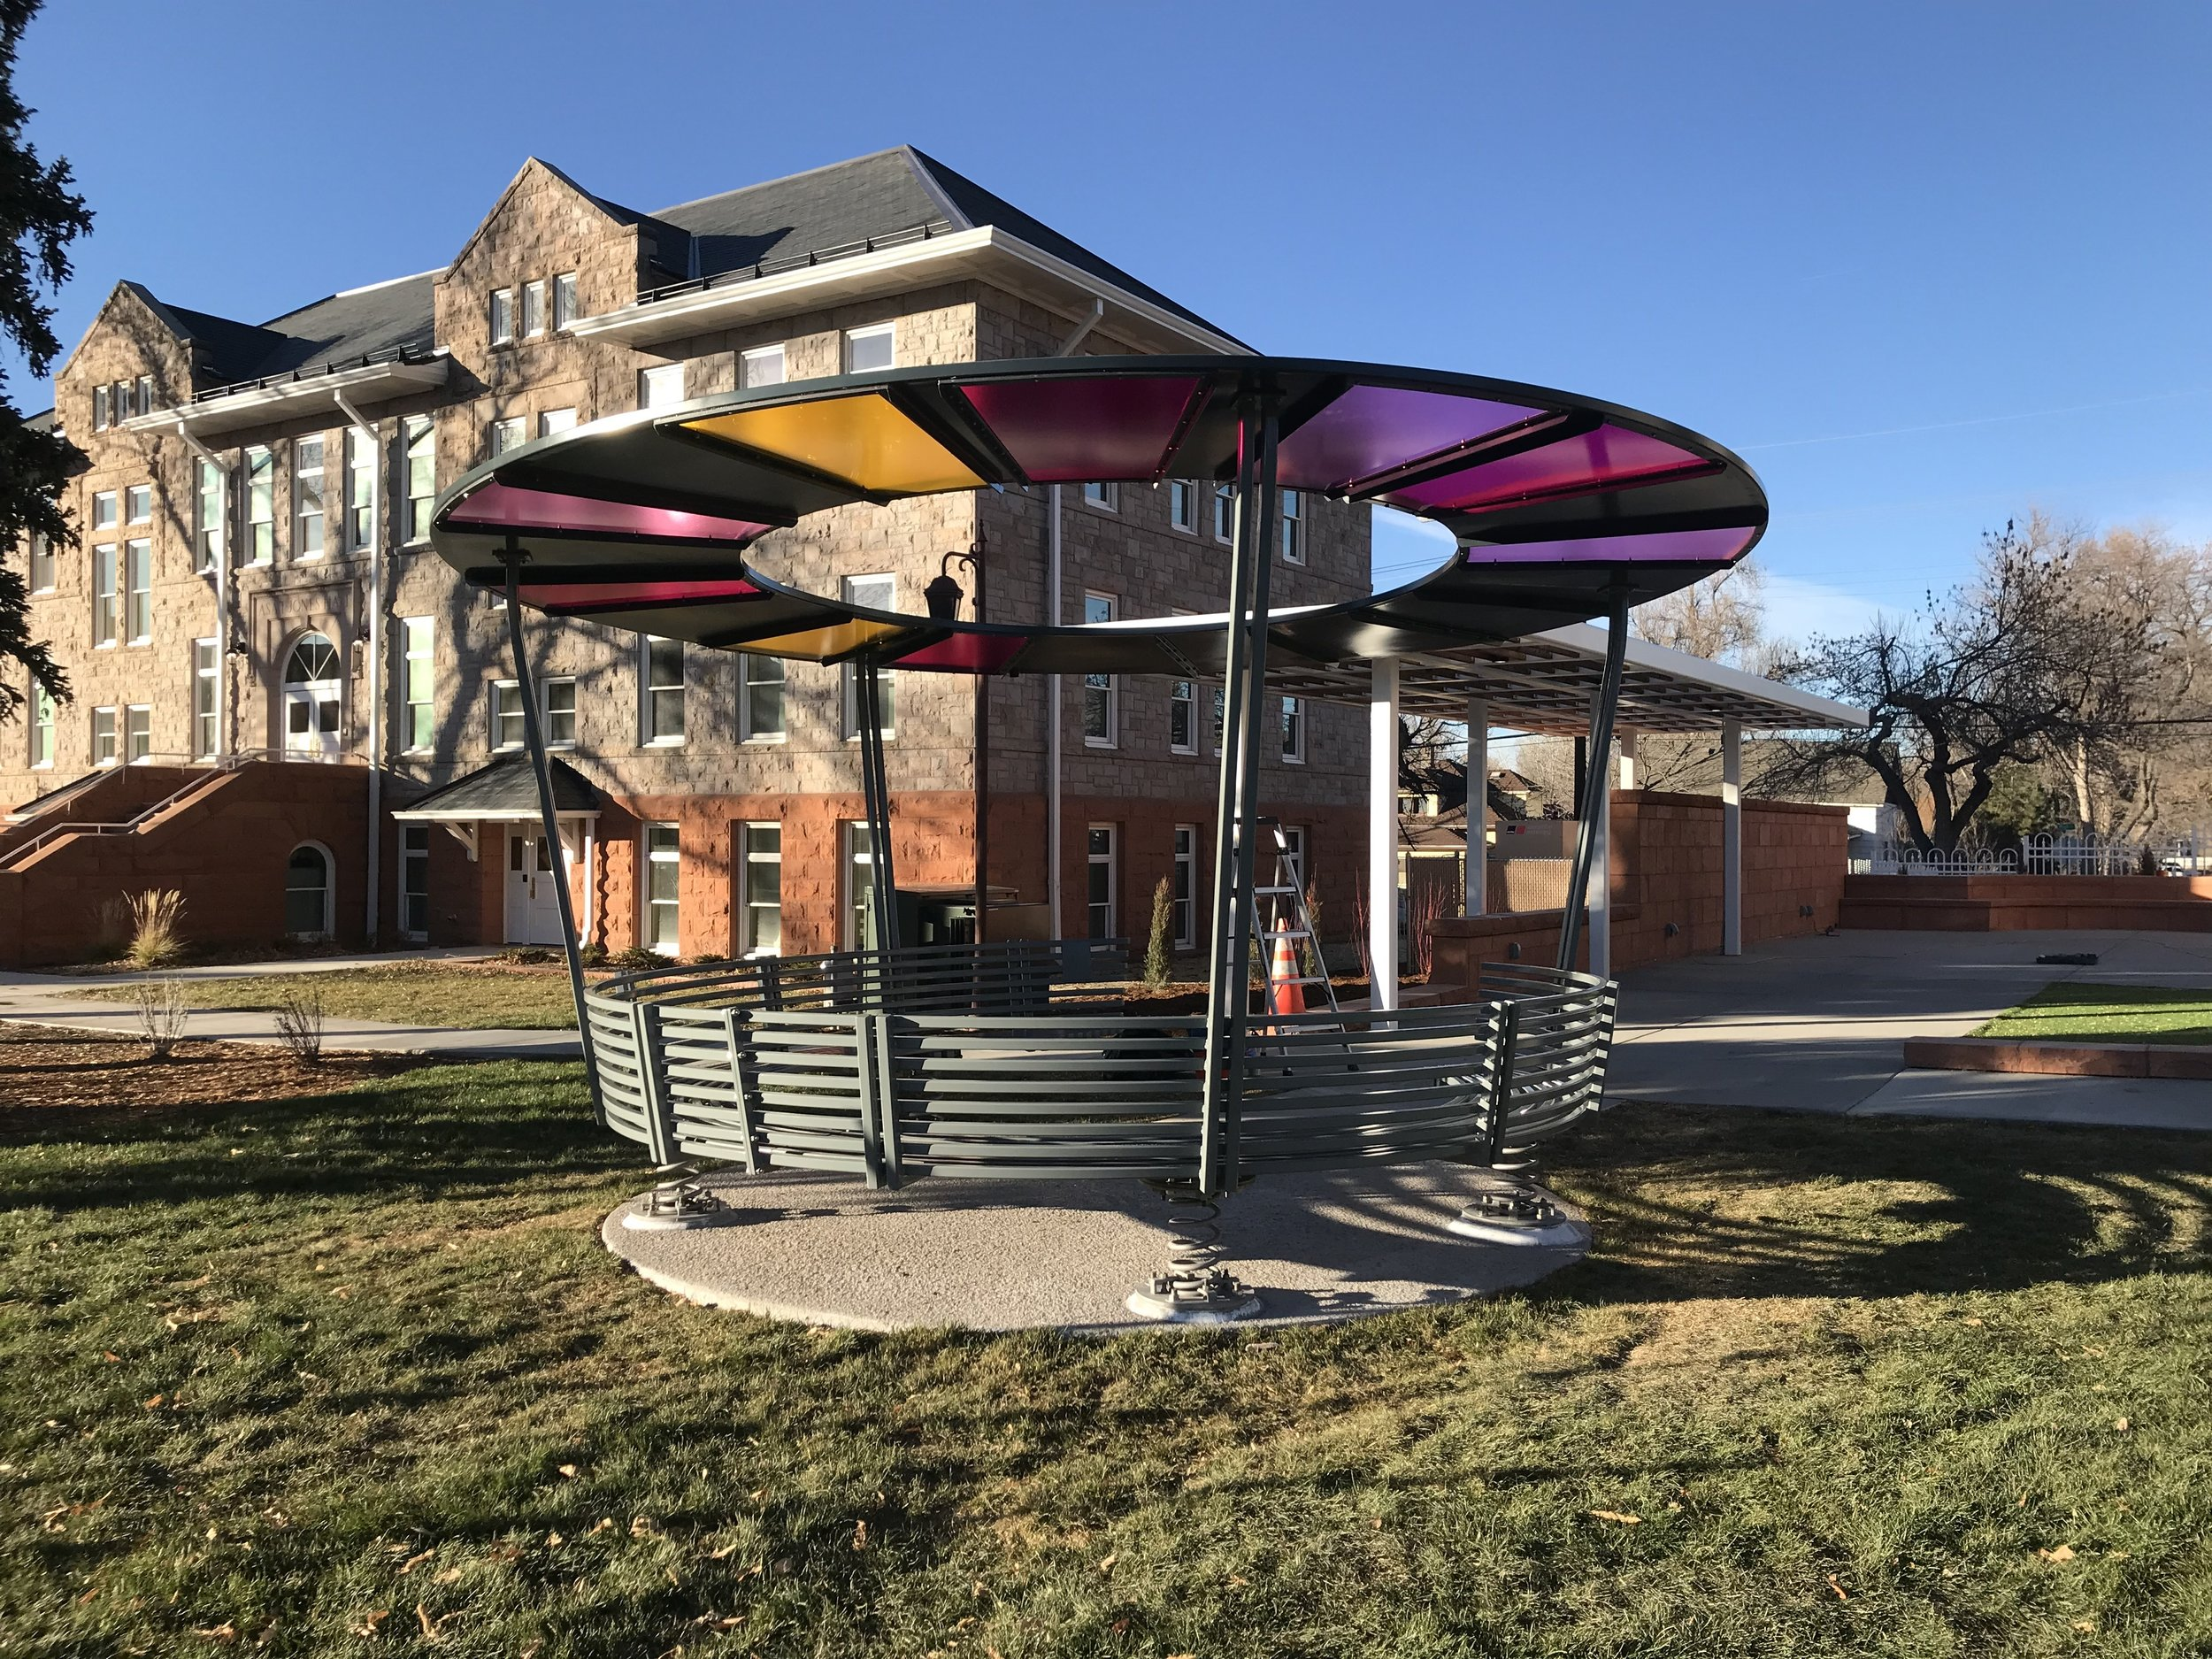 Matthew Geller_Springs_Colorado Springs_Public Art Services_J Grant Projects_16.JPG